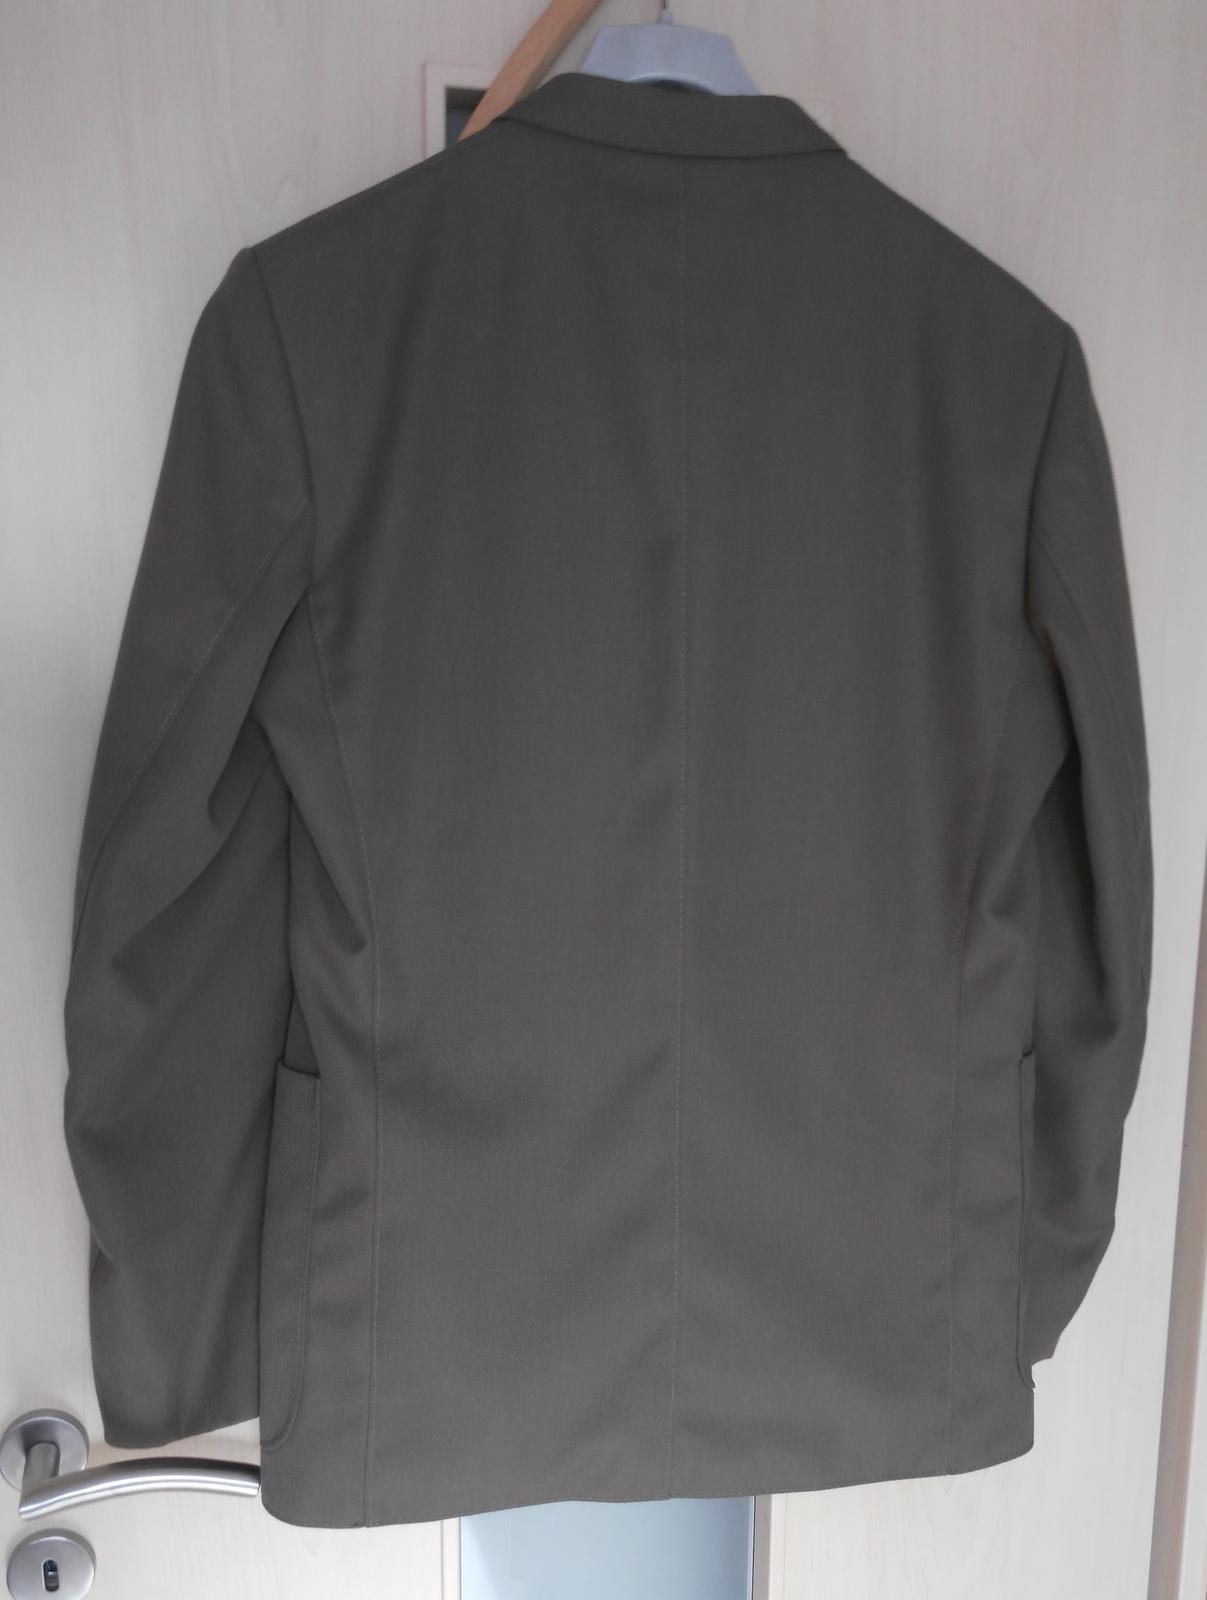 Hnedo-khaki oblek č.52 - Obrázok č. 2